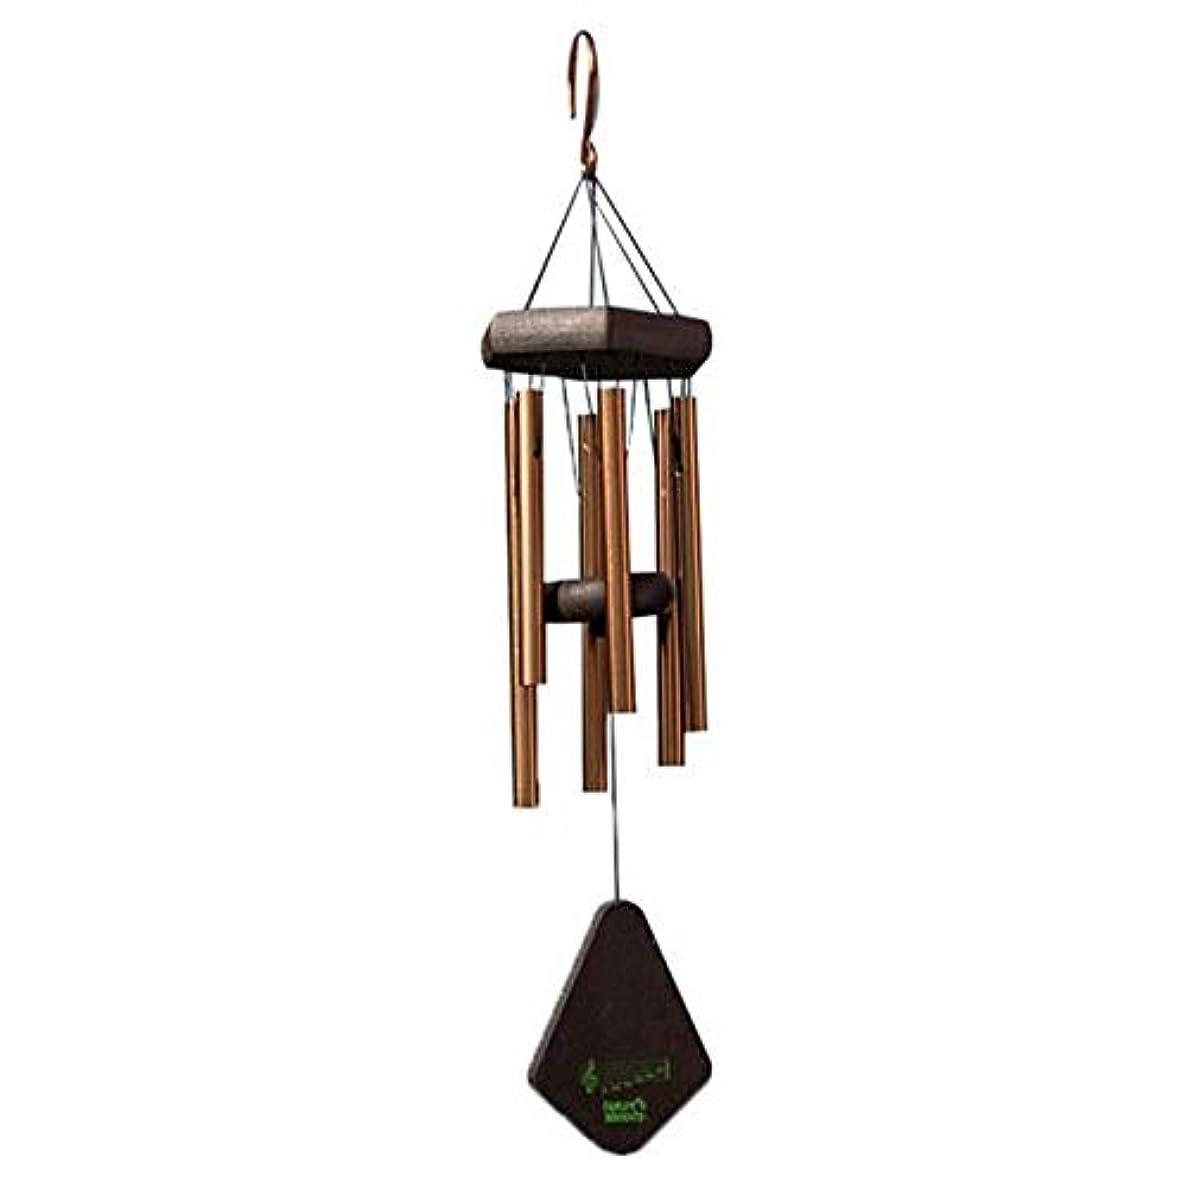 Jielongtongxun 風チャイム、メタル6チューブ風の鐘、ブラック、全身について52CM,絶妙な飾り (Color : Gold)